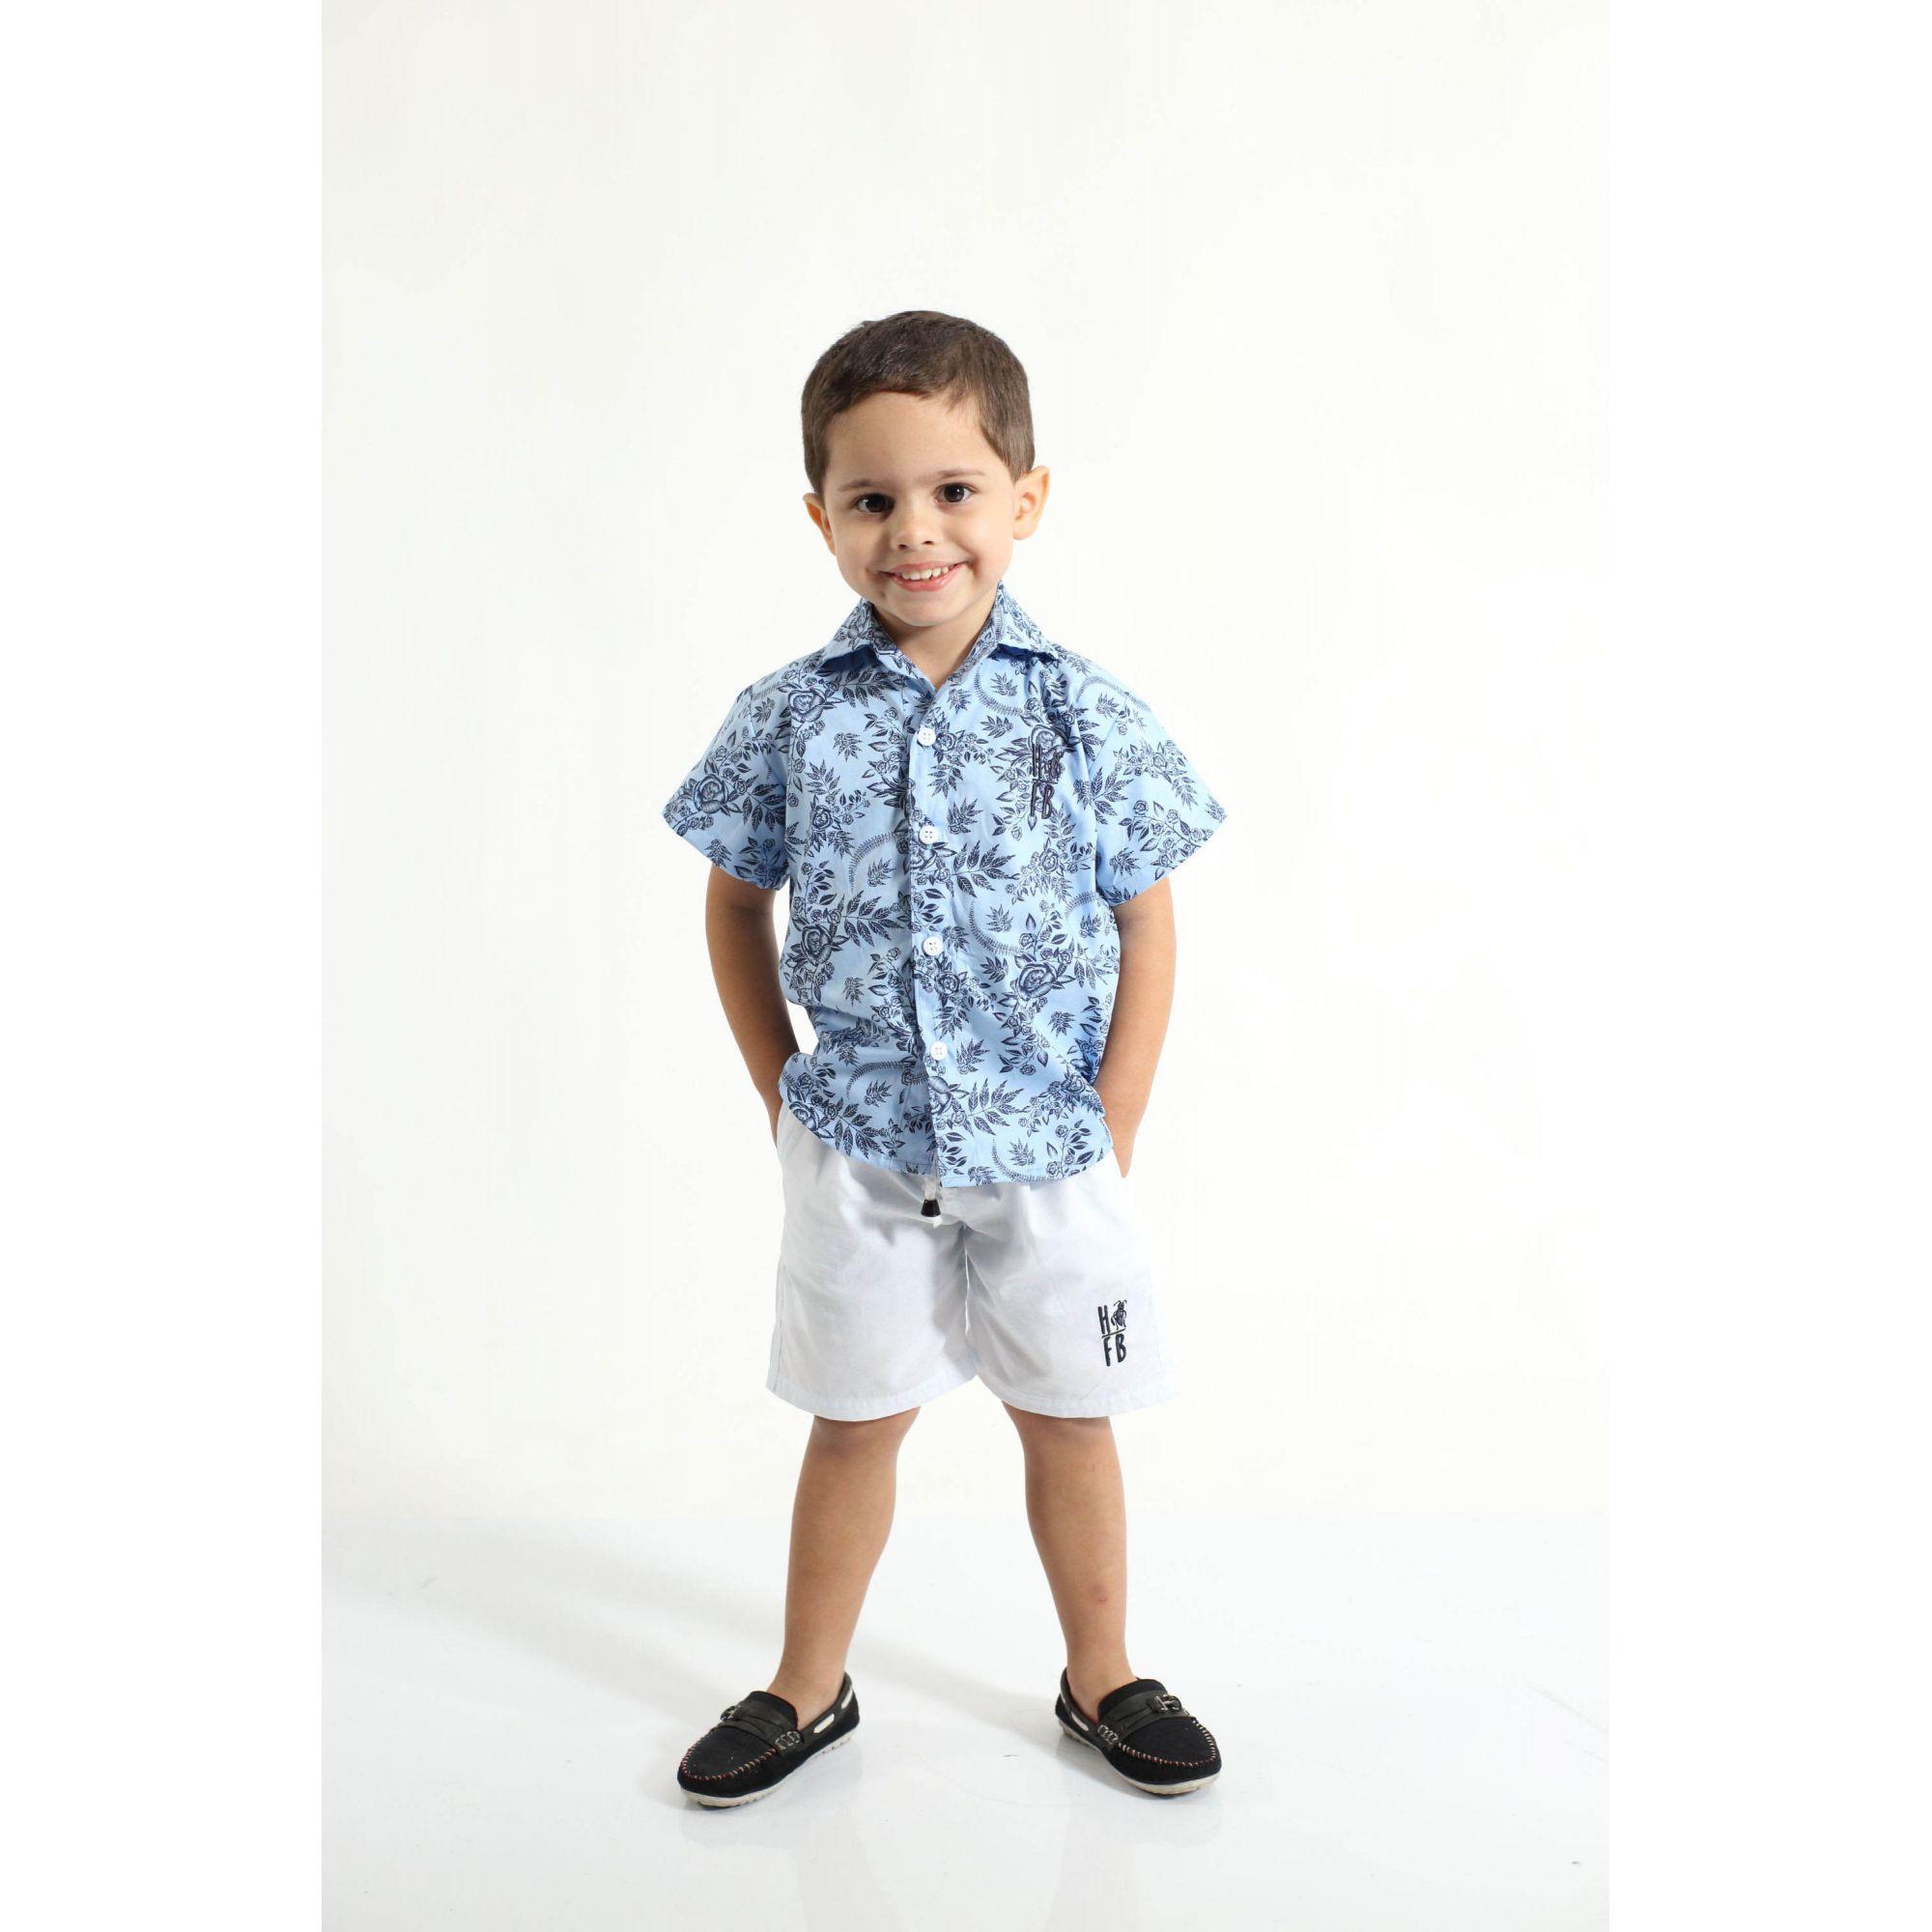 MÃE E FILHO > Kit 02 Camisas Social Adulto e Infantil Azul Floral [Coleção Tal Mãe Tal Filho]  - Heitor Fashion Brazil